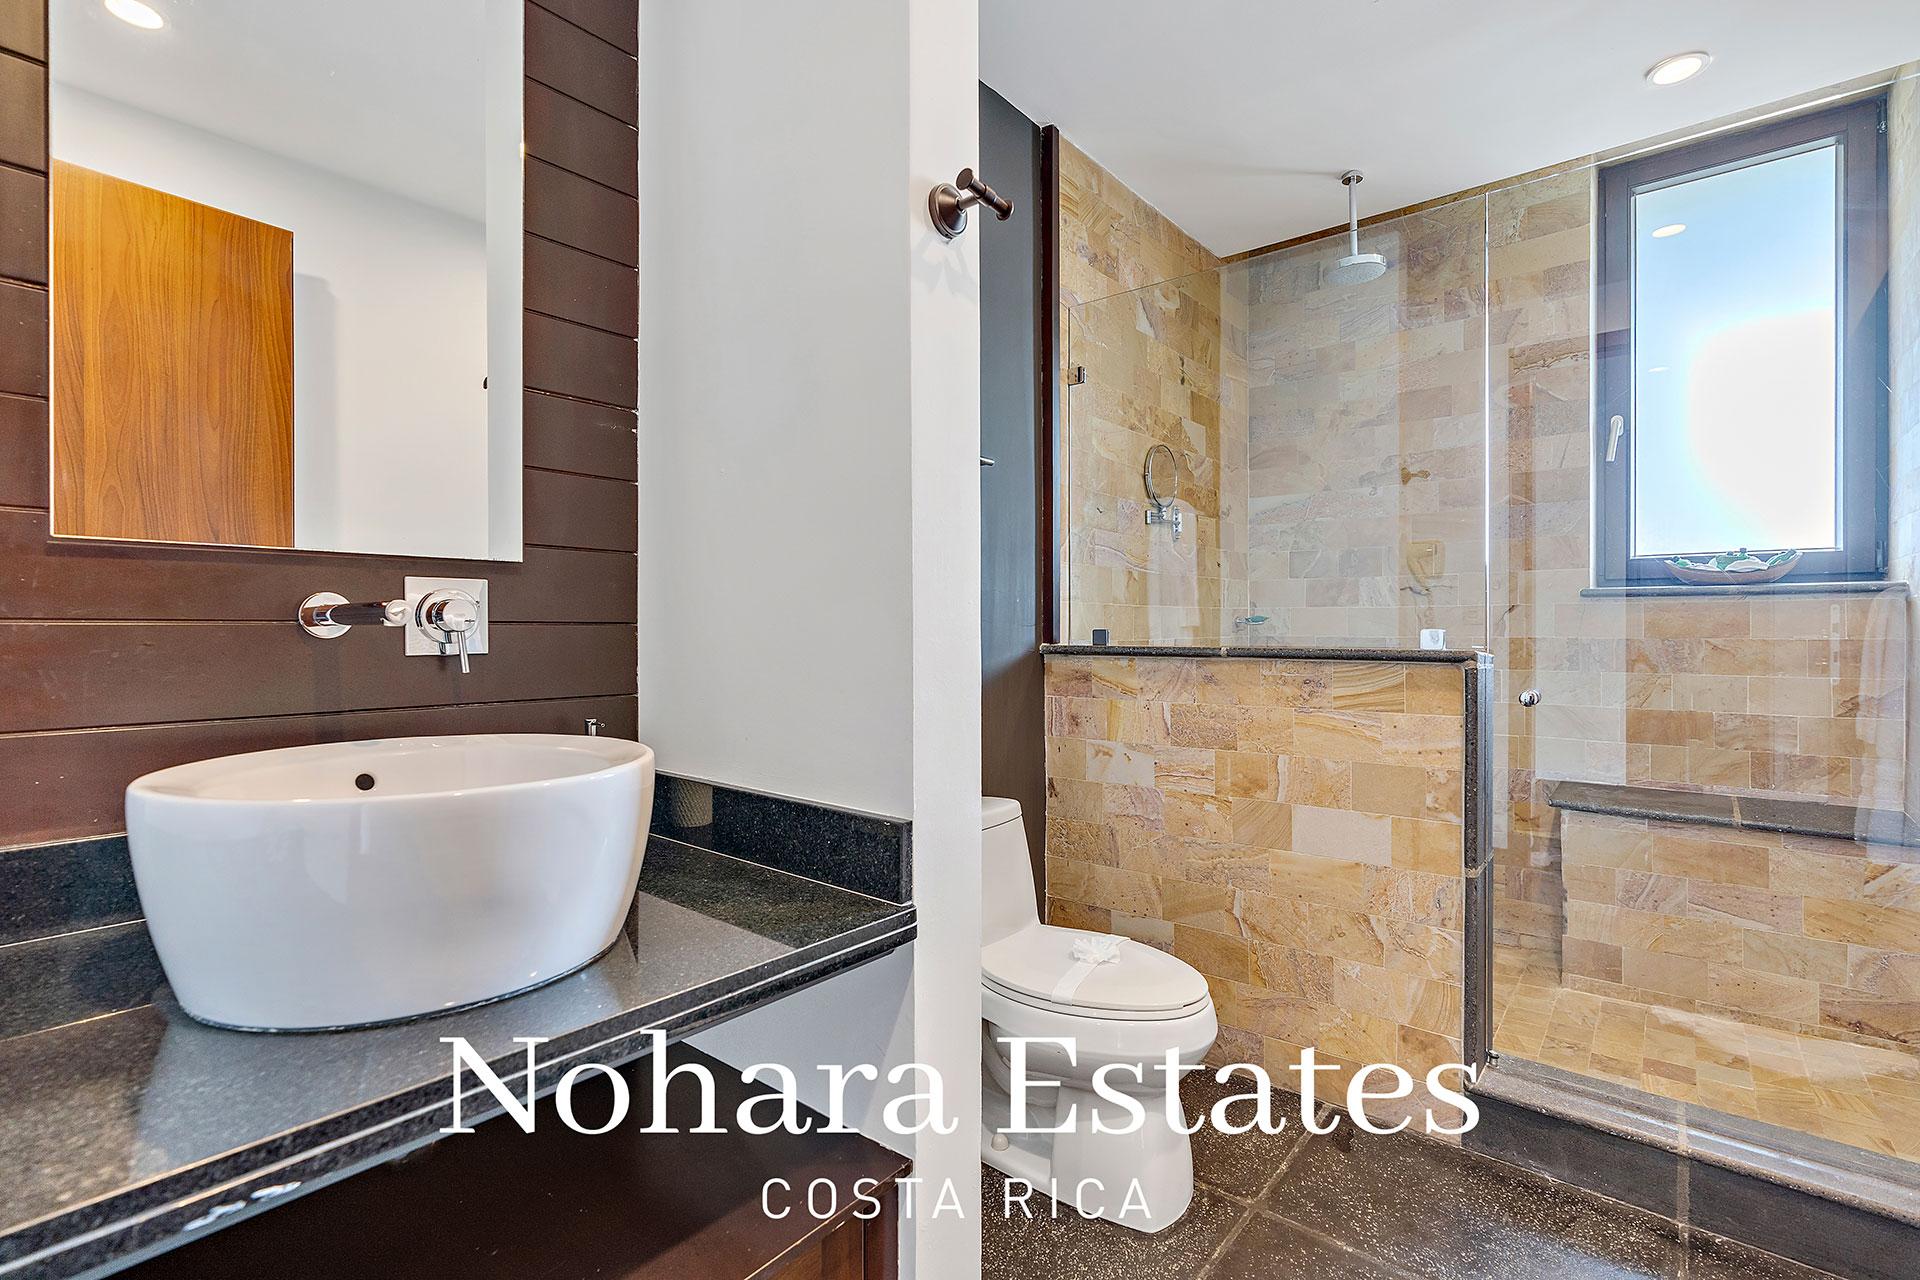 Nohara Estates Costa Rica 128 Penthouse Quepos Los Altos 12